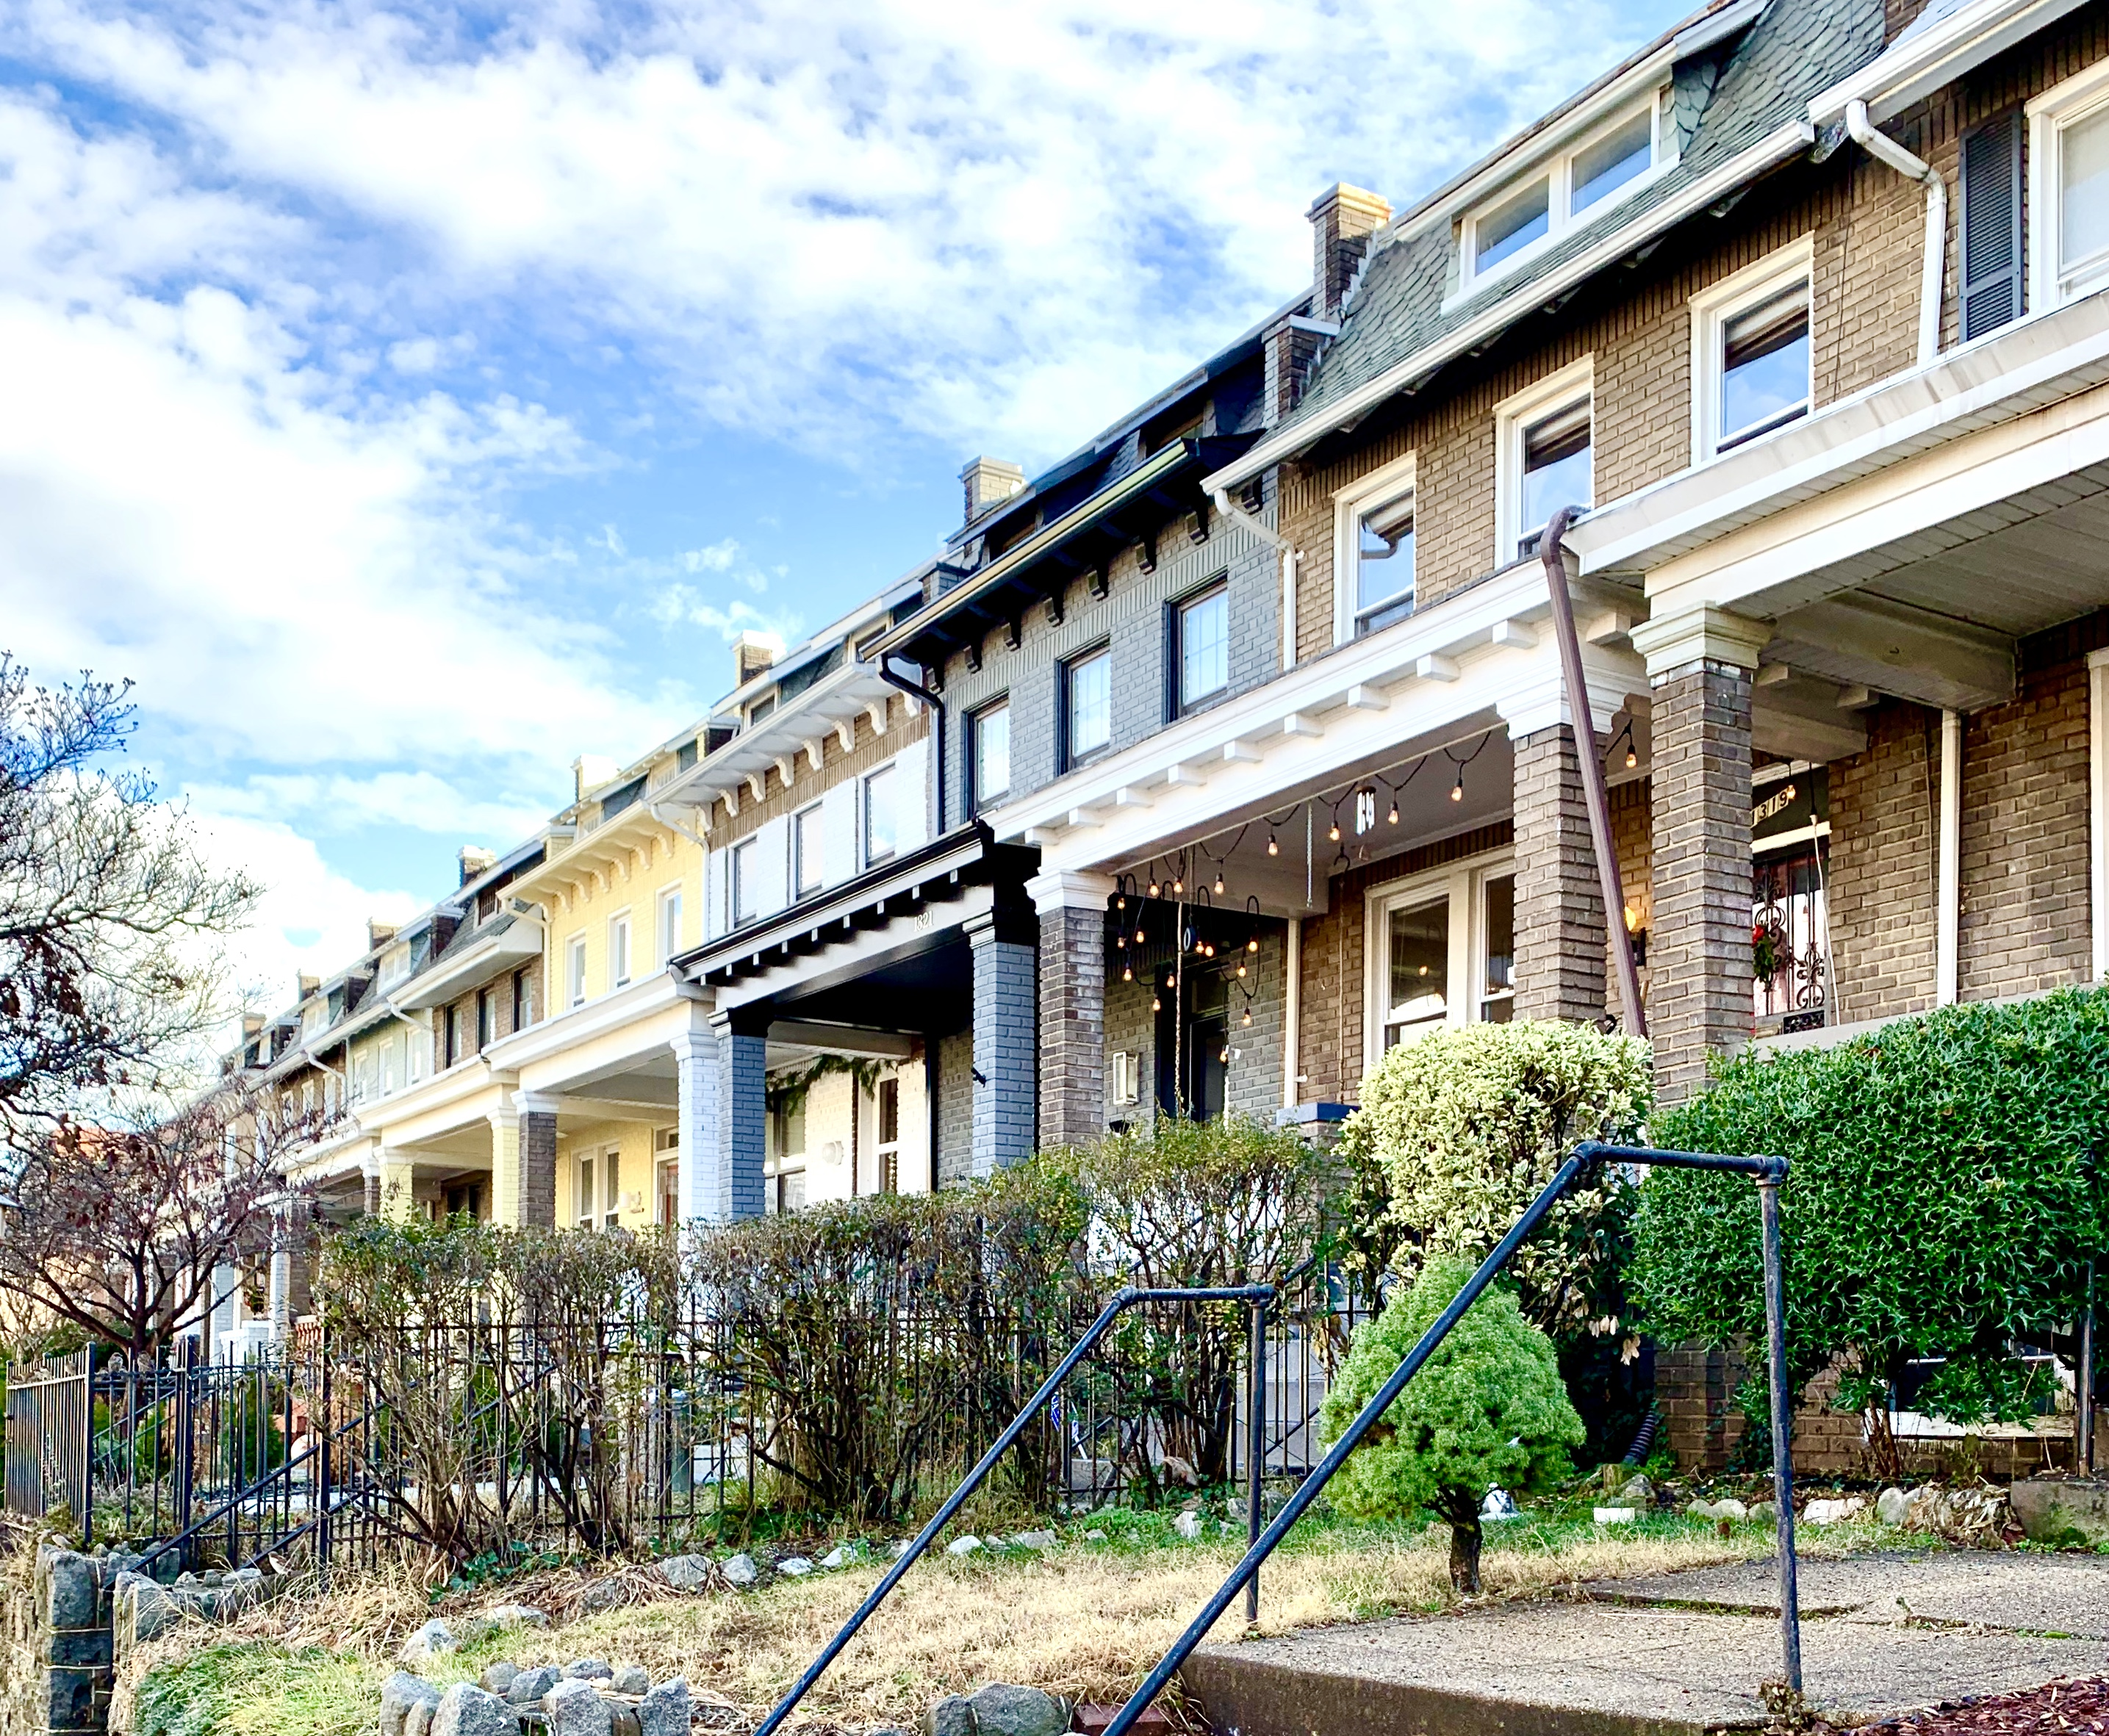 Craftsman Homes in Washington, DC. E Street NE in Capitol Hill